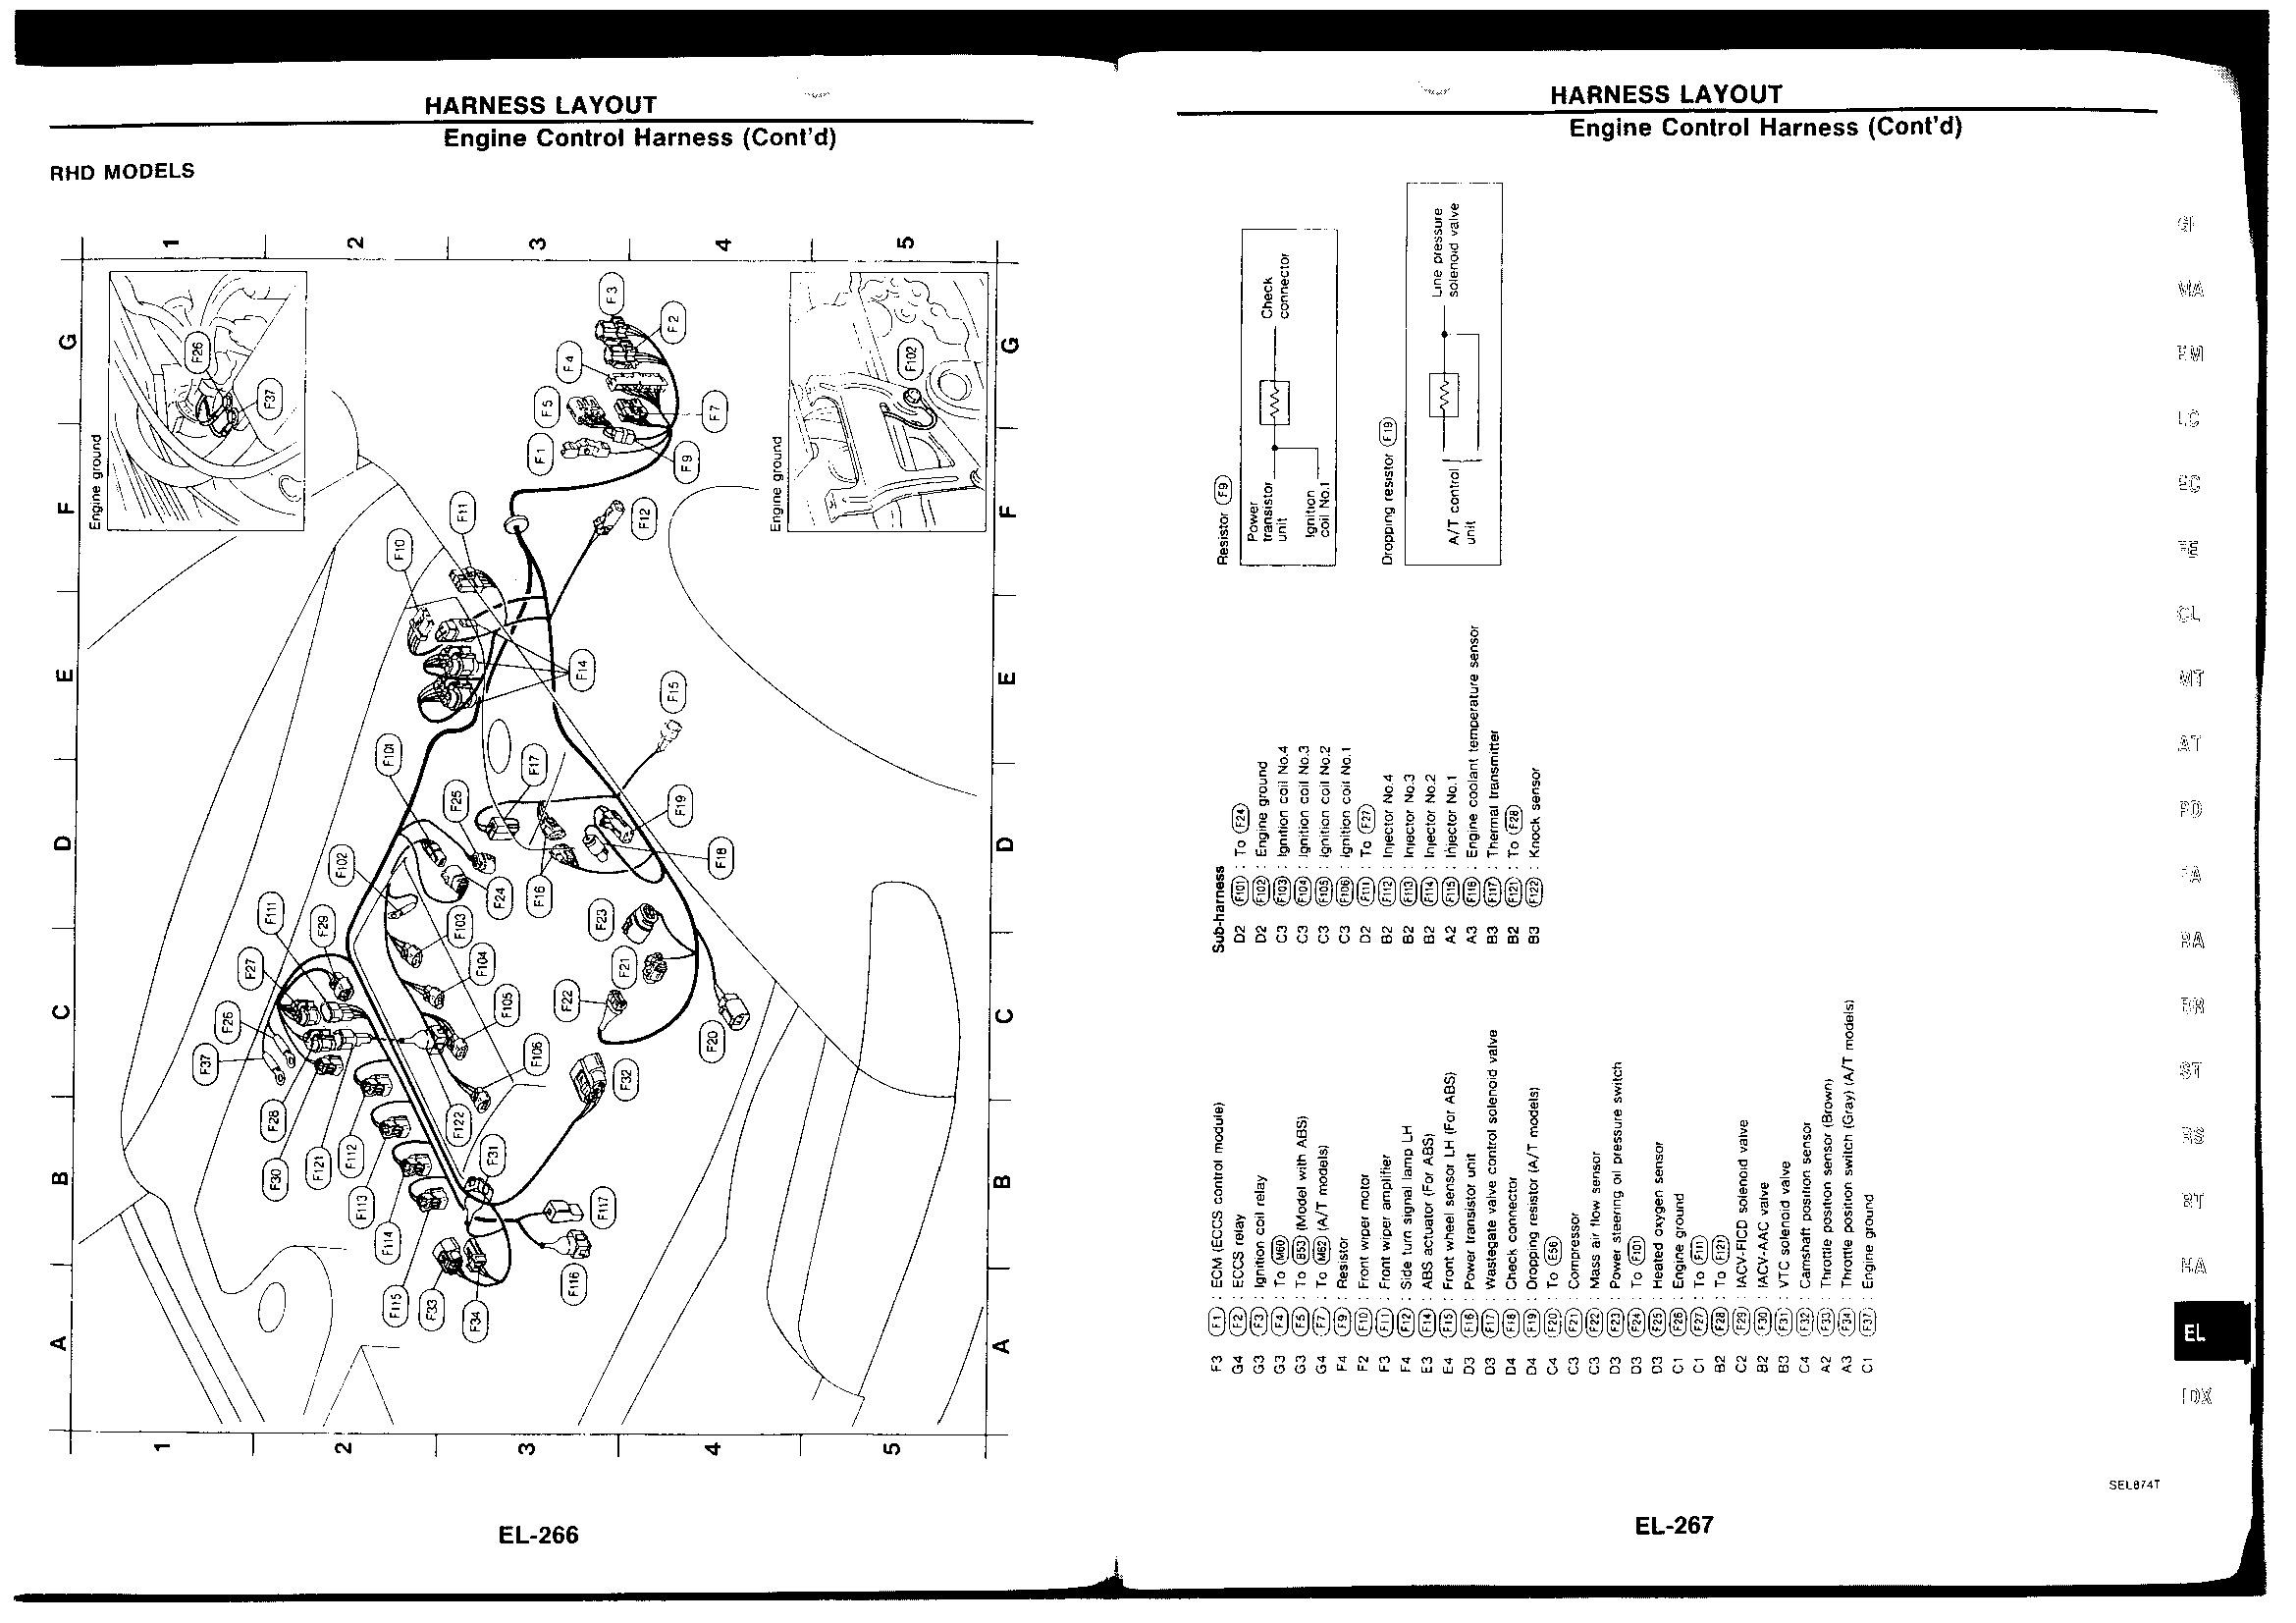 s14_zenki_sr20det_english_text_page_802?w\\\=820\\\&h\\\=580 s14 radio wiring diagram 60 series ecm pins diagram \u2022 edmiracle co  at fashall.co